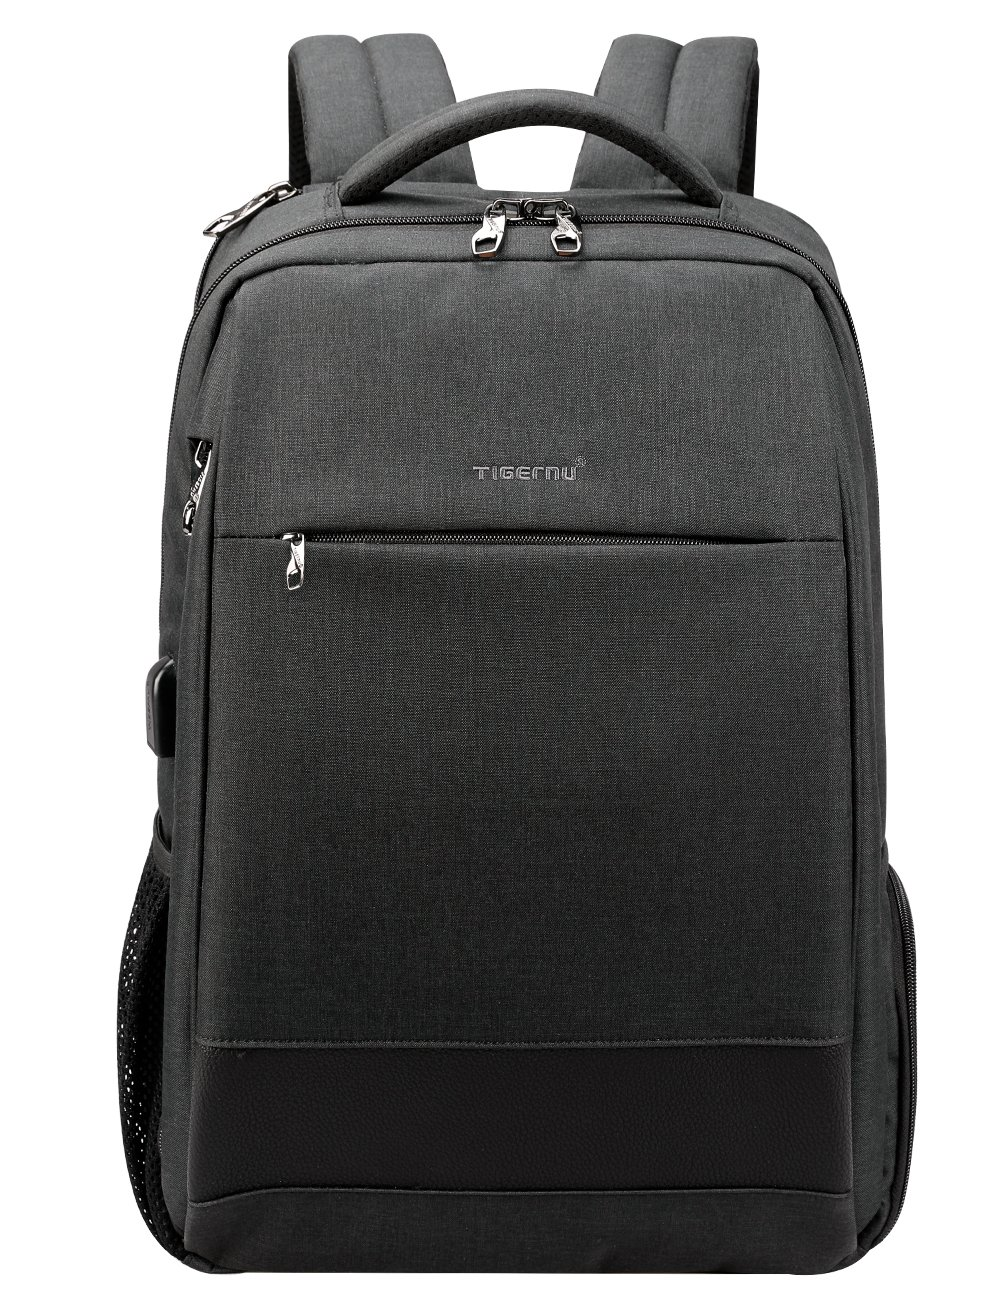 Travel Laptop Backpack, Anti-Theft Business Daypacks with USB Charging Port, Tigernu Water Resistant College School Bookbag for Men/Women, Slim Computer Bag Fits up to 15.6'' Laptops/Notebook, Black